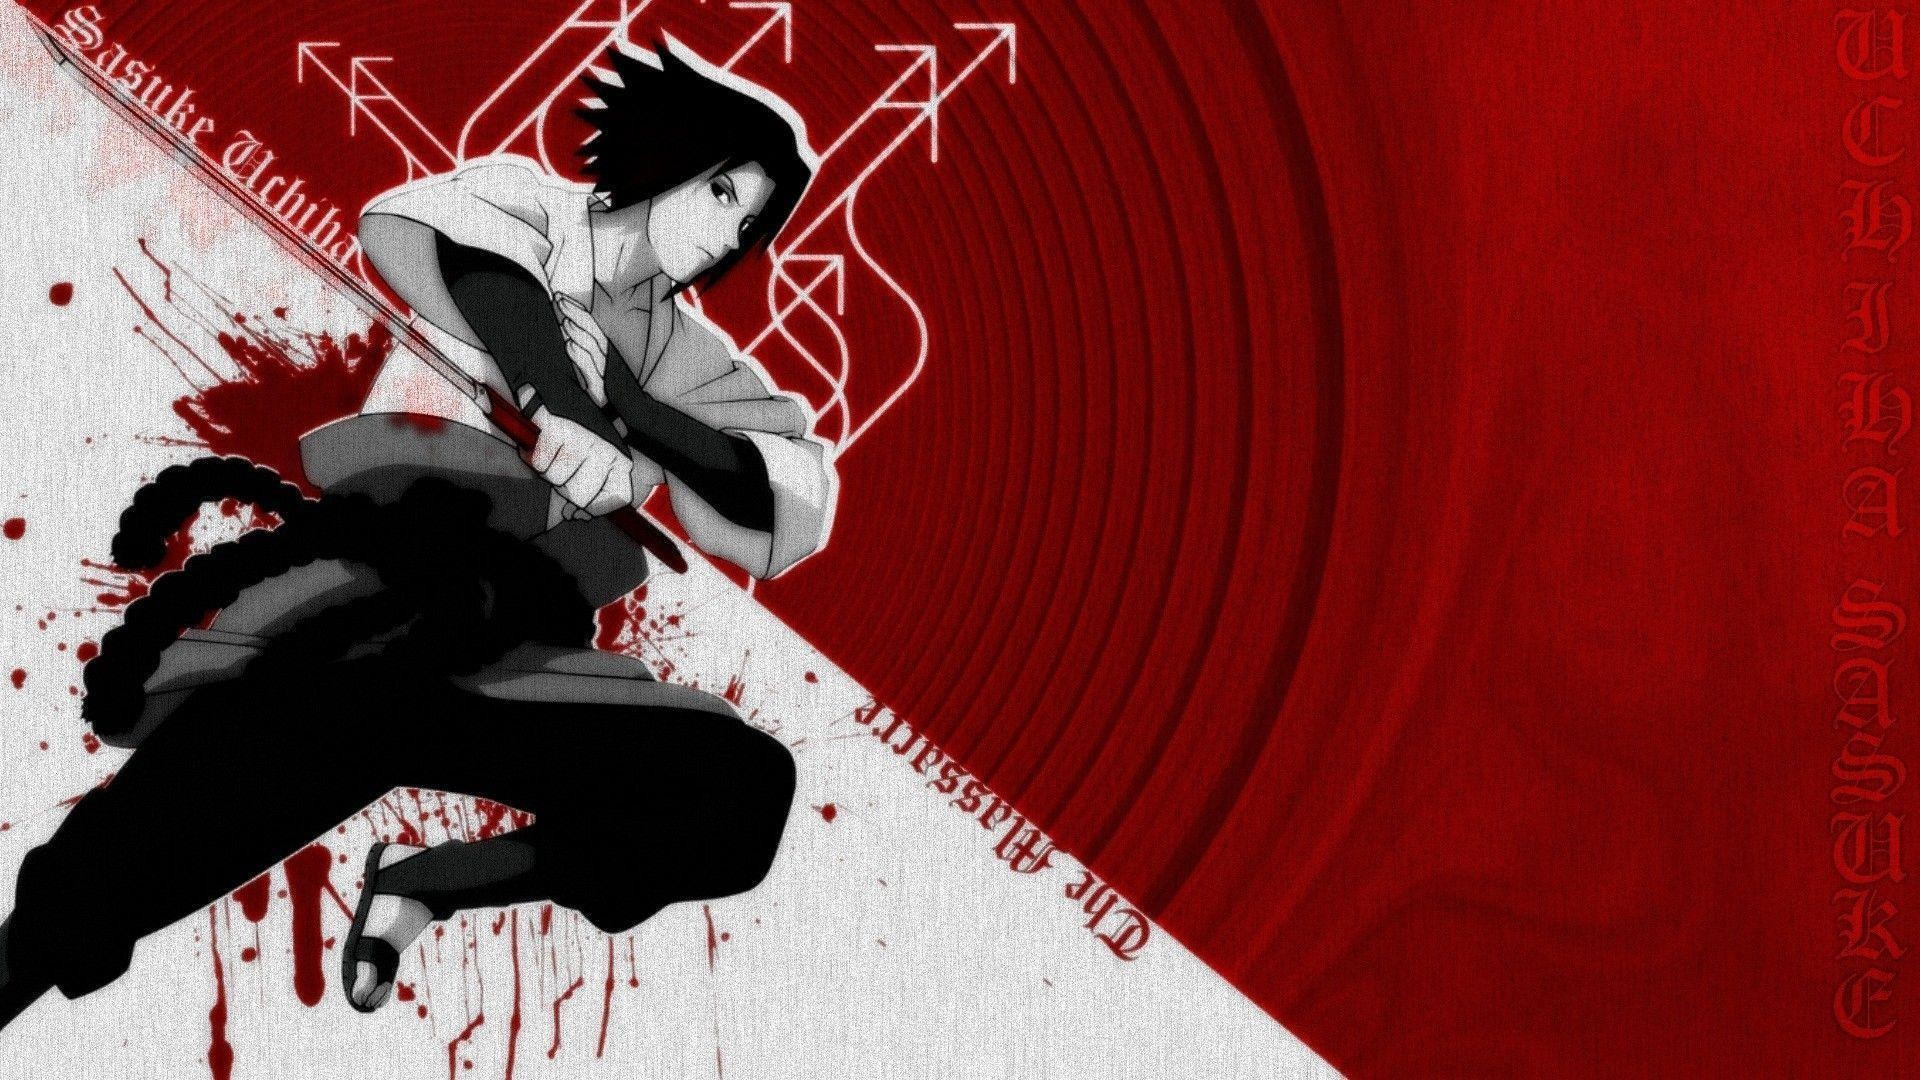 Wallpapers For > Sasuke Uchiha Wallpaper Desktop